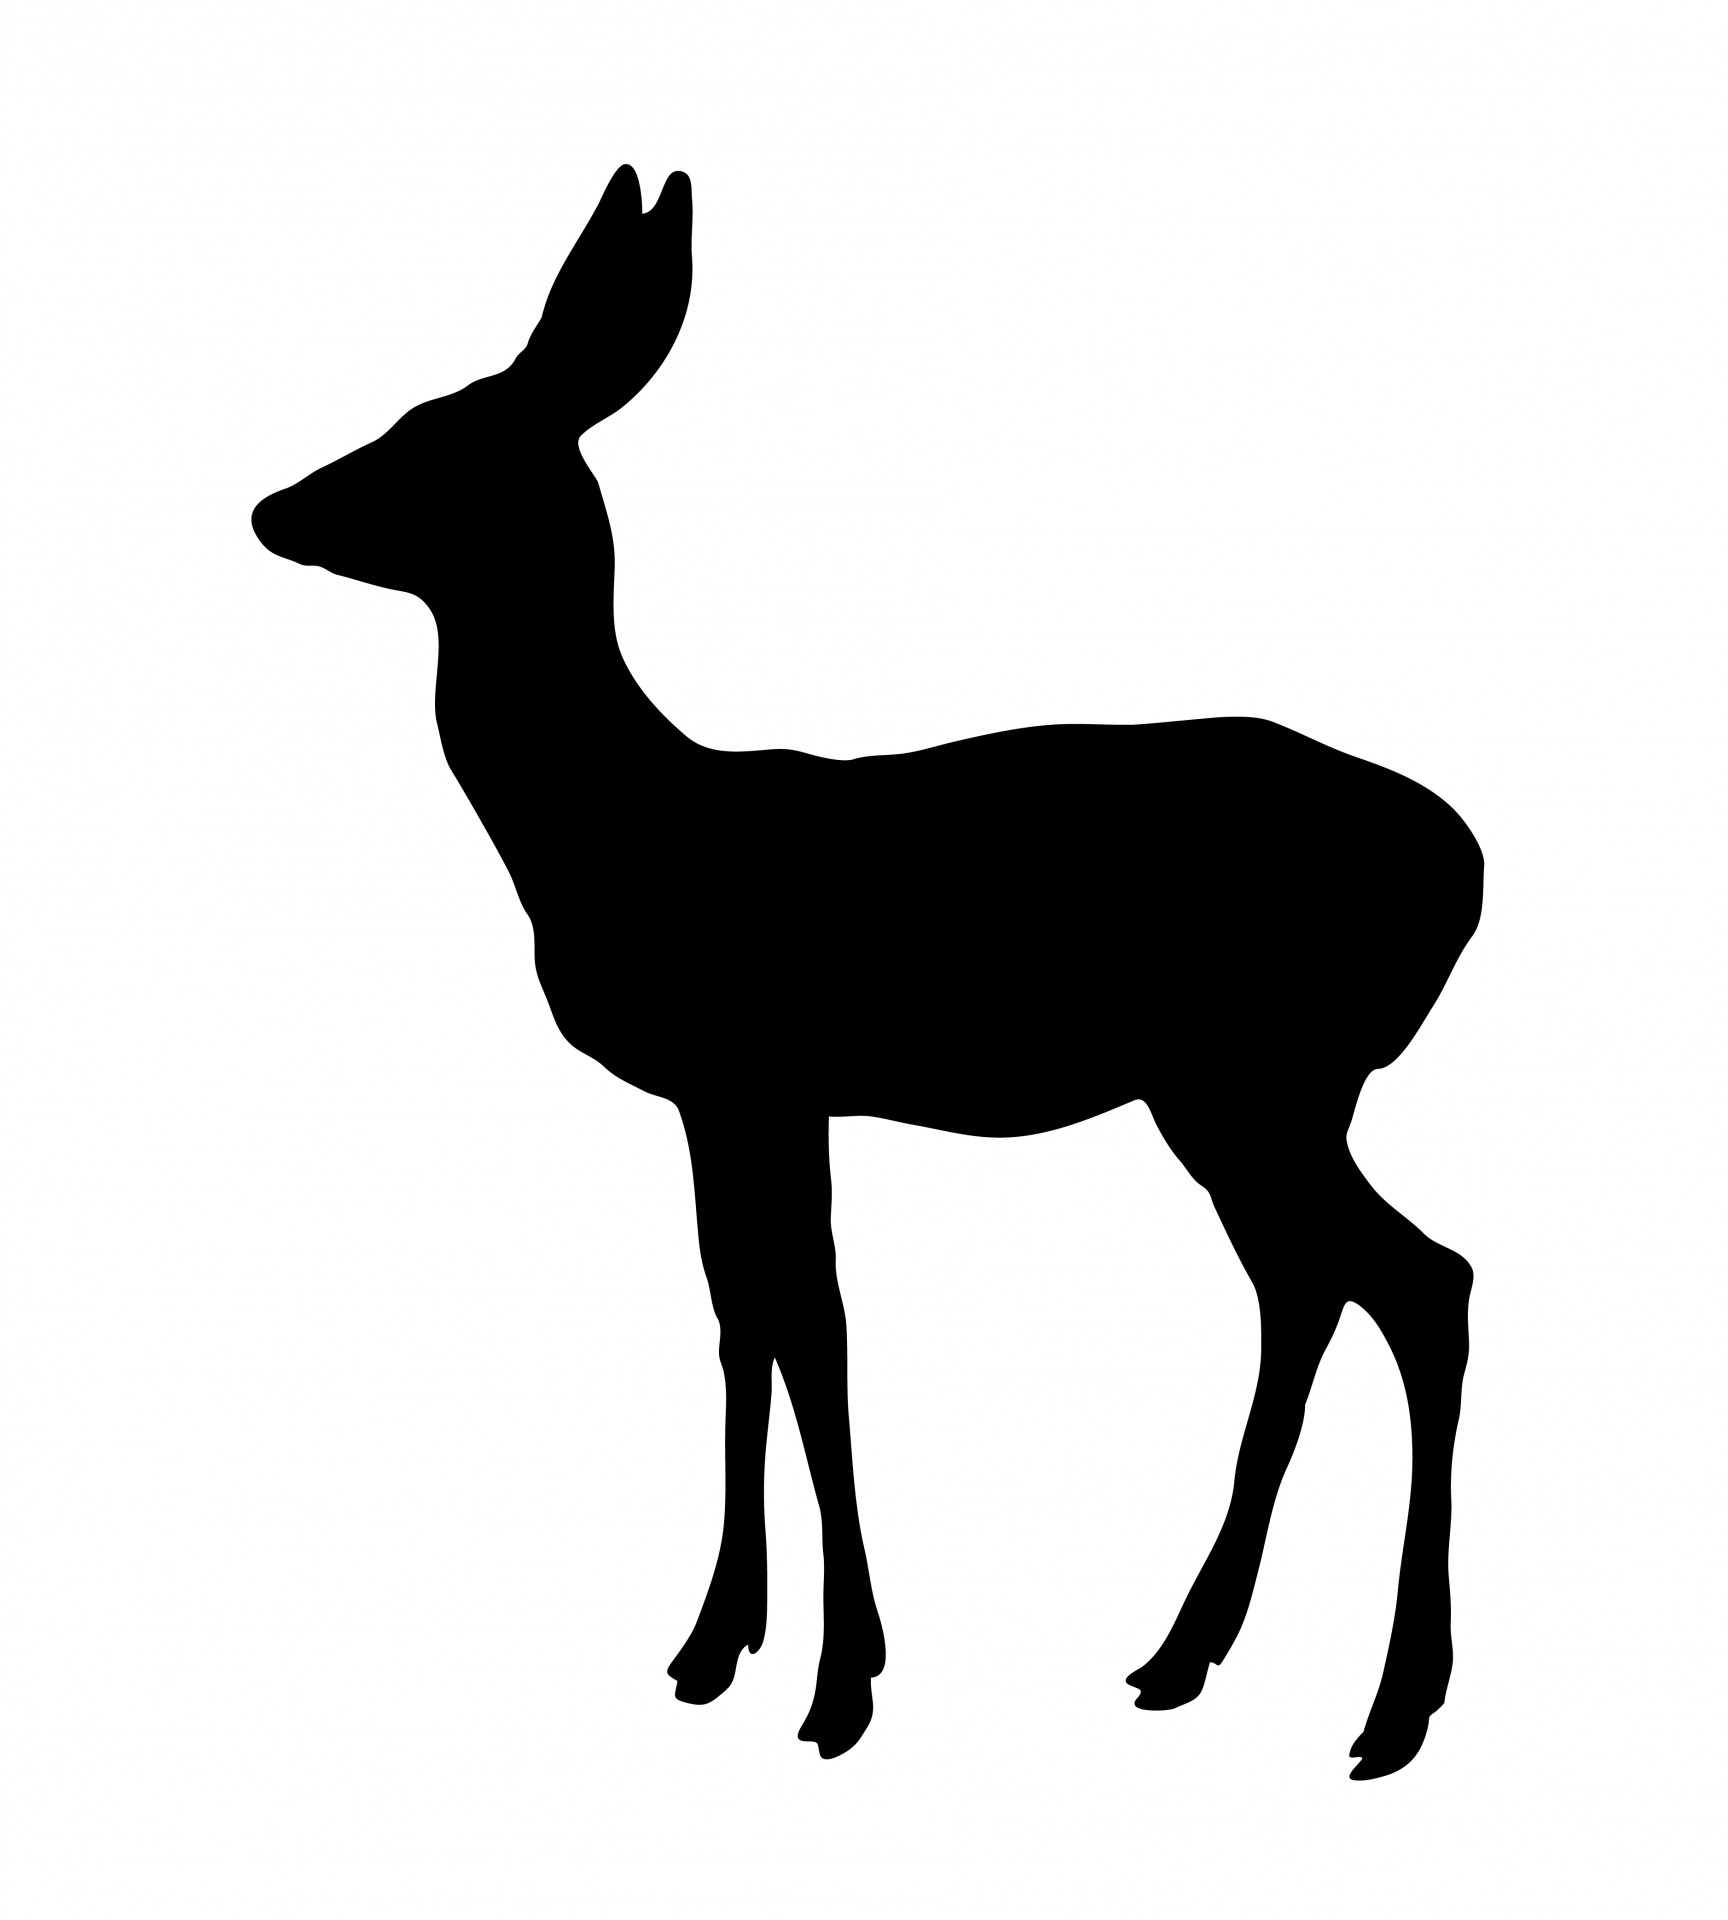 1728x1920 Deer Silhouette Free Stock Photo